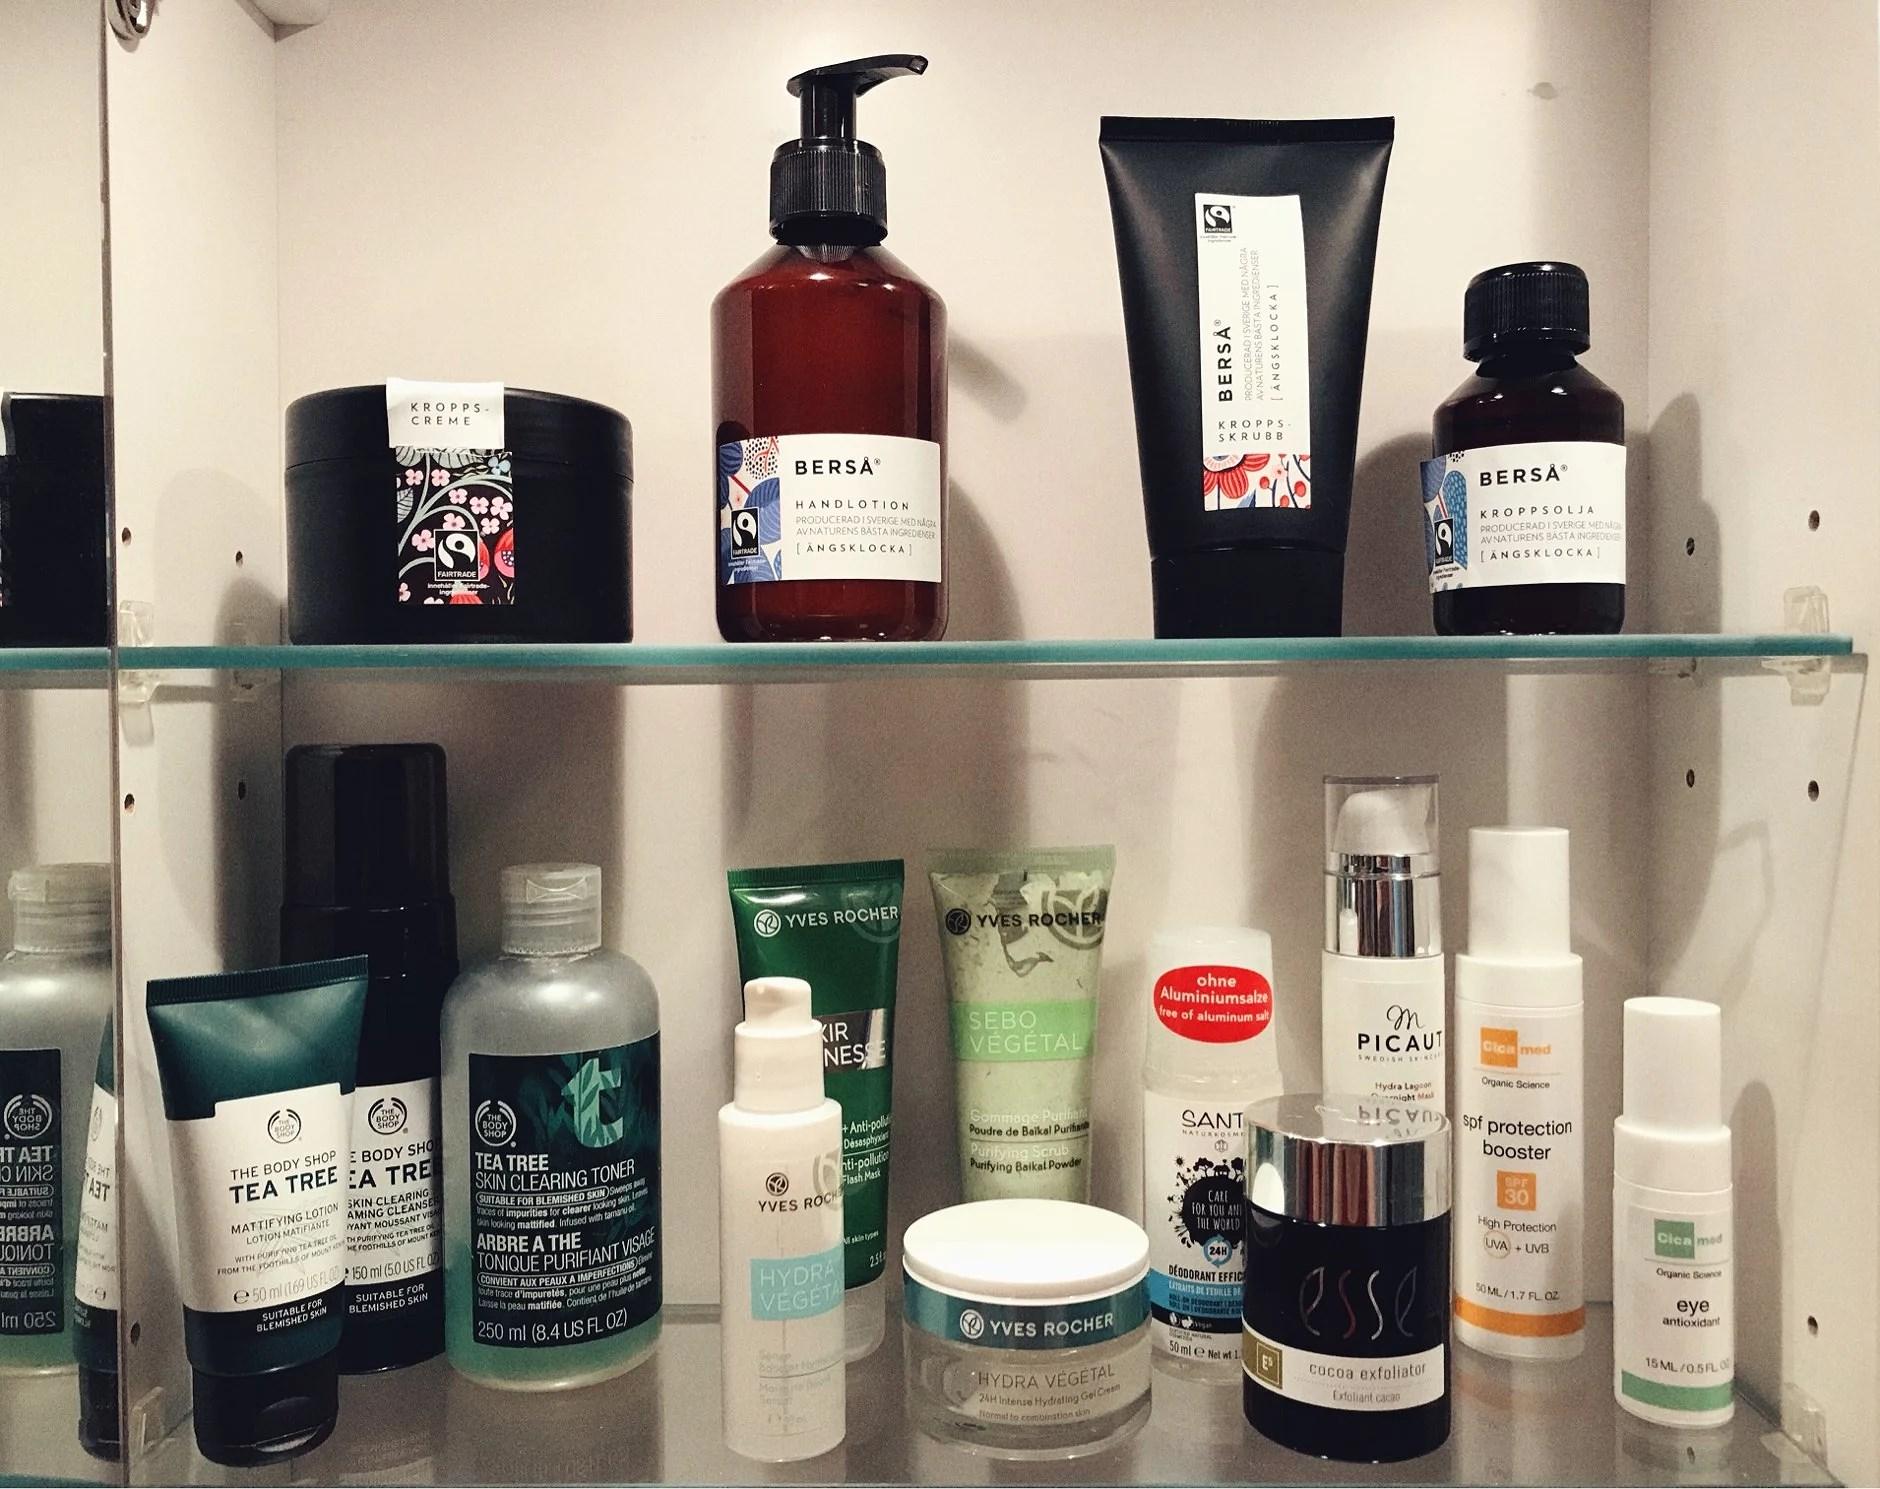 The prettiest shelf I ever did see!